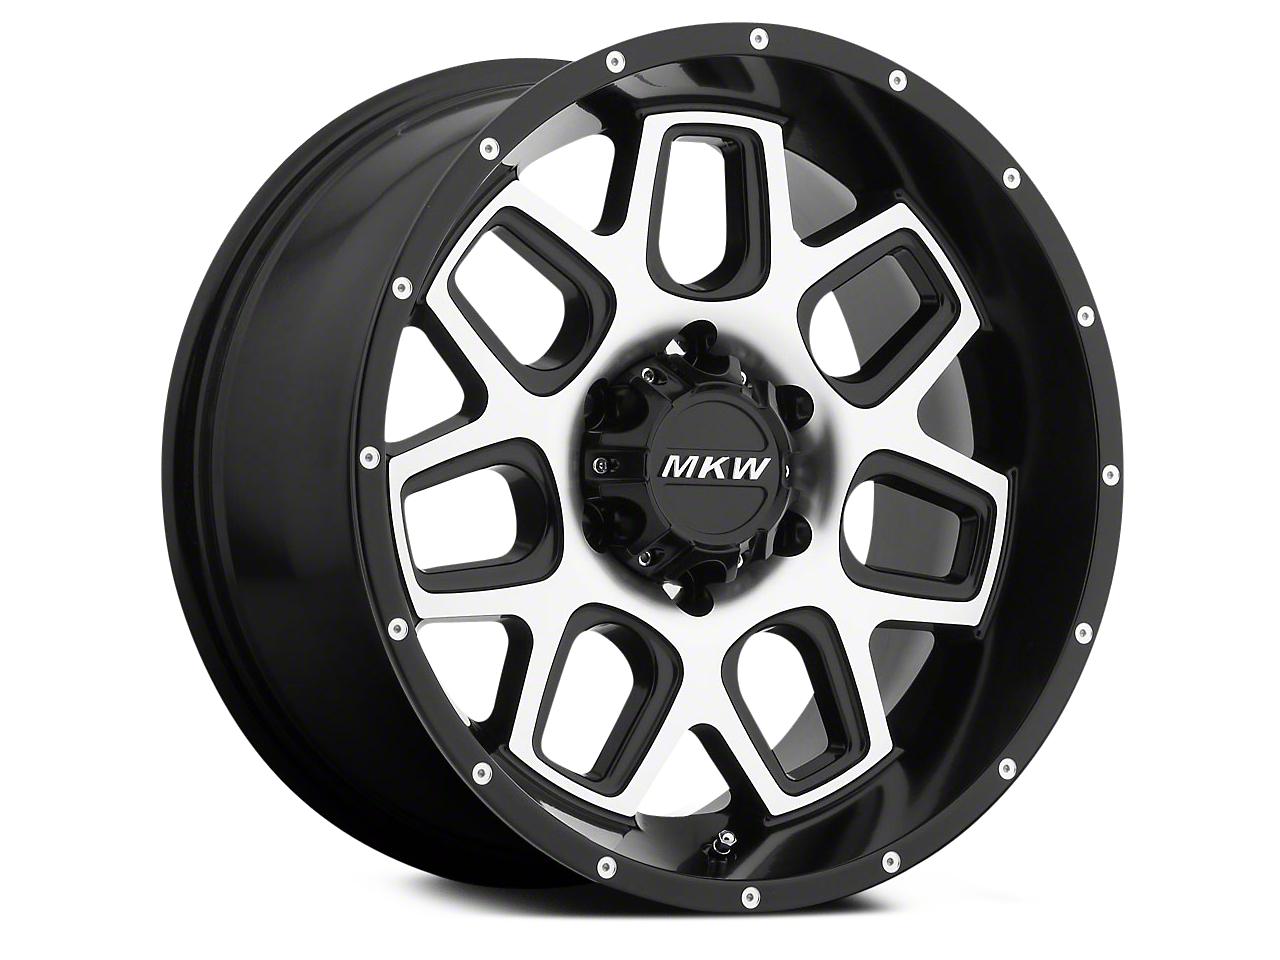 MKW Offroad M92 Satin Black Machined 6-Lug Wheel - 20x9 (04-18 All)